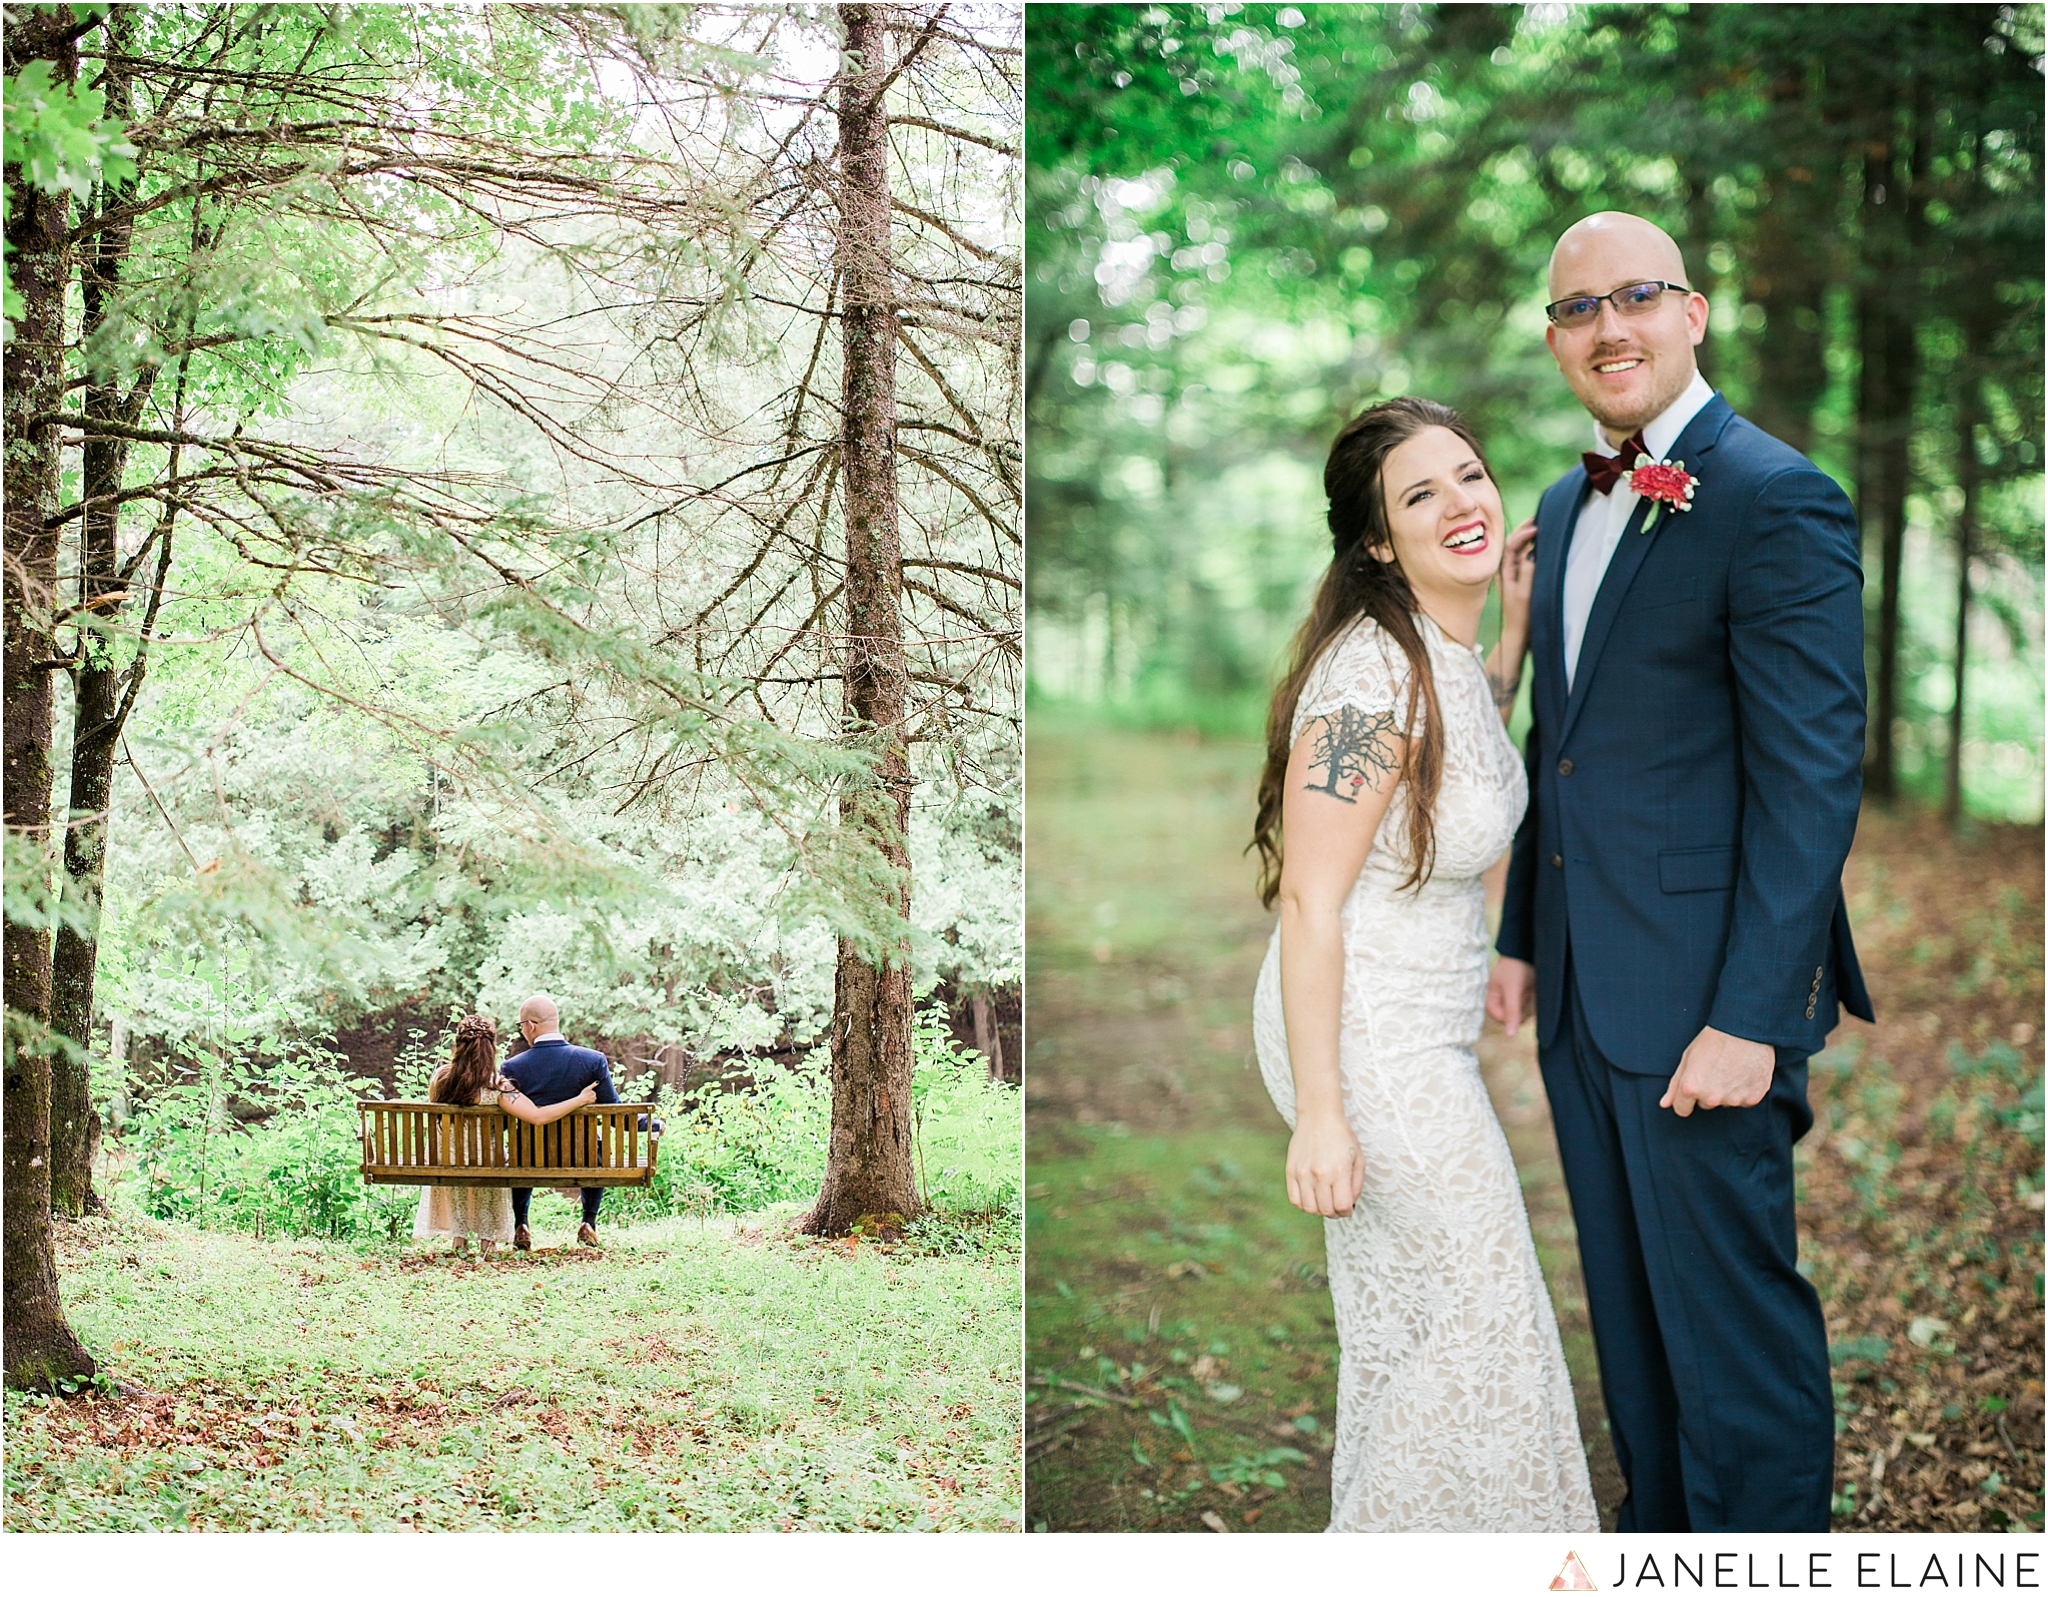 janelle elaine photography-seattle-destination-wedding-photographer-82.jpg